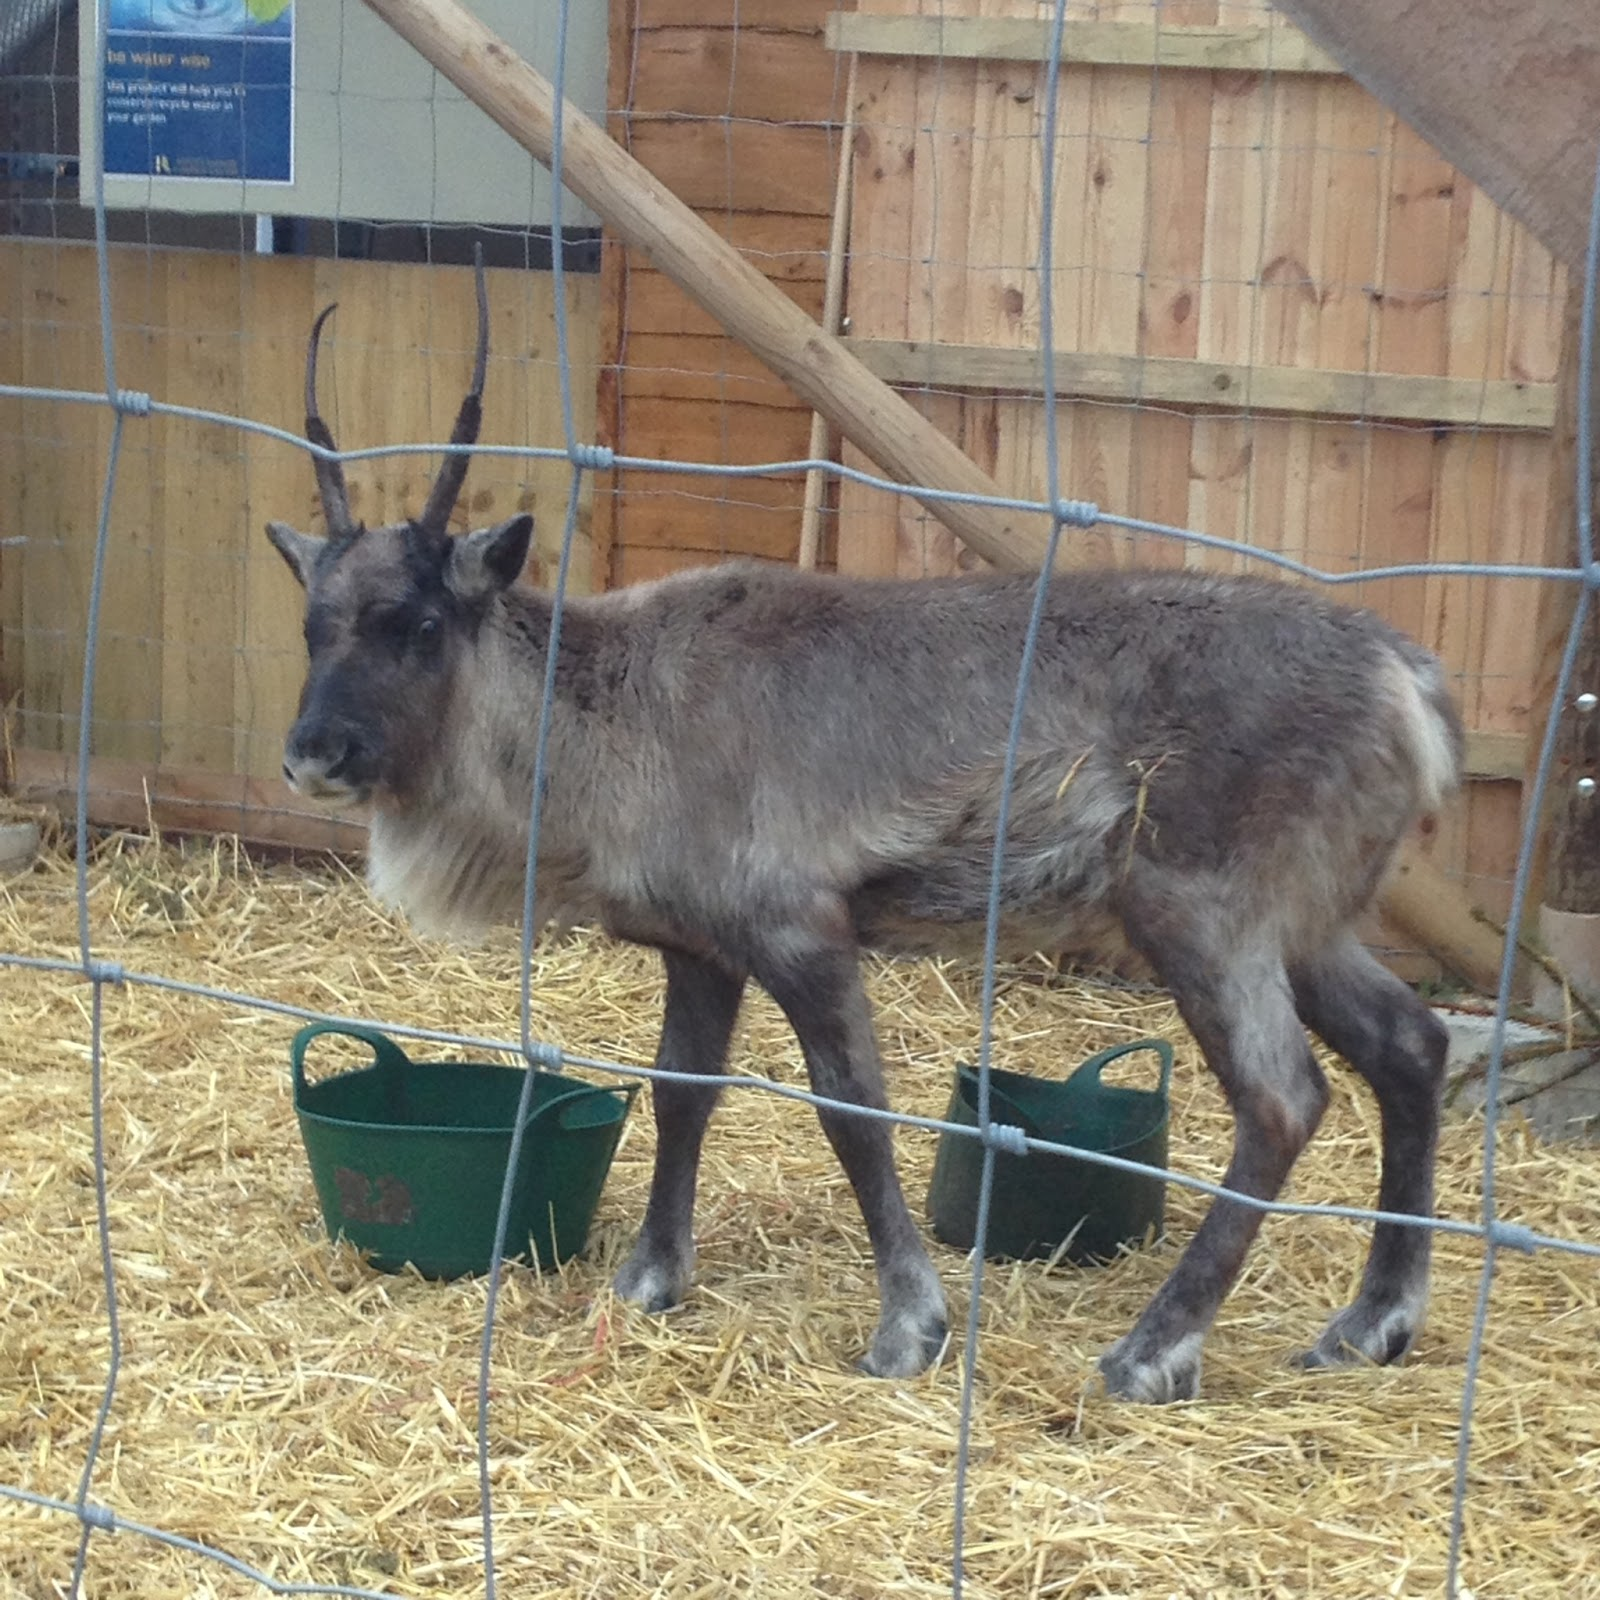 ruxley manor garden centre reindeer